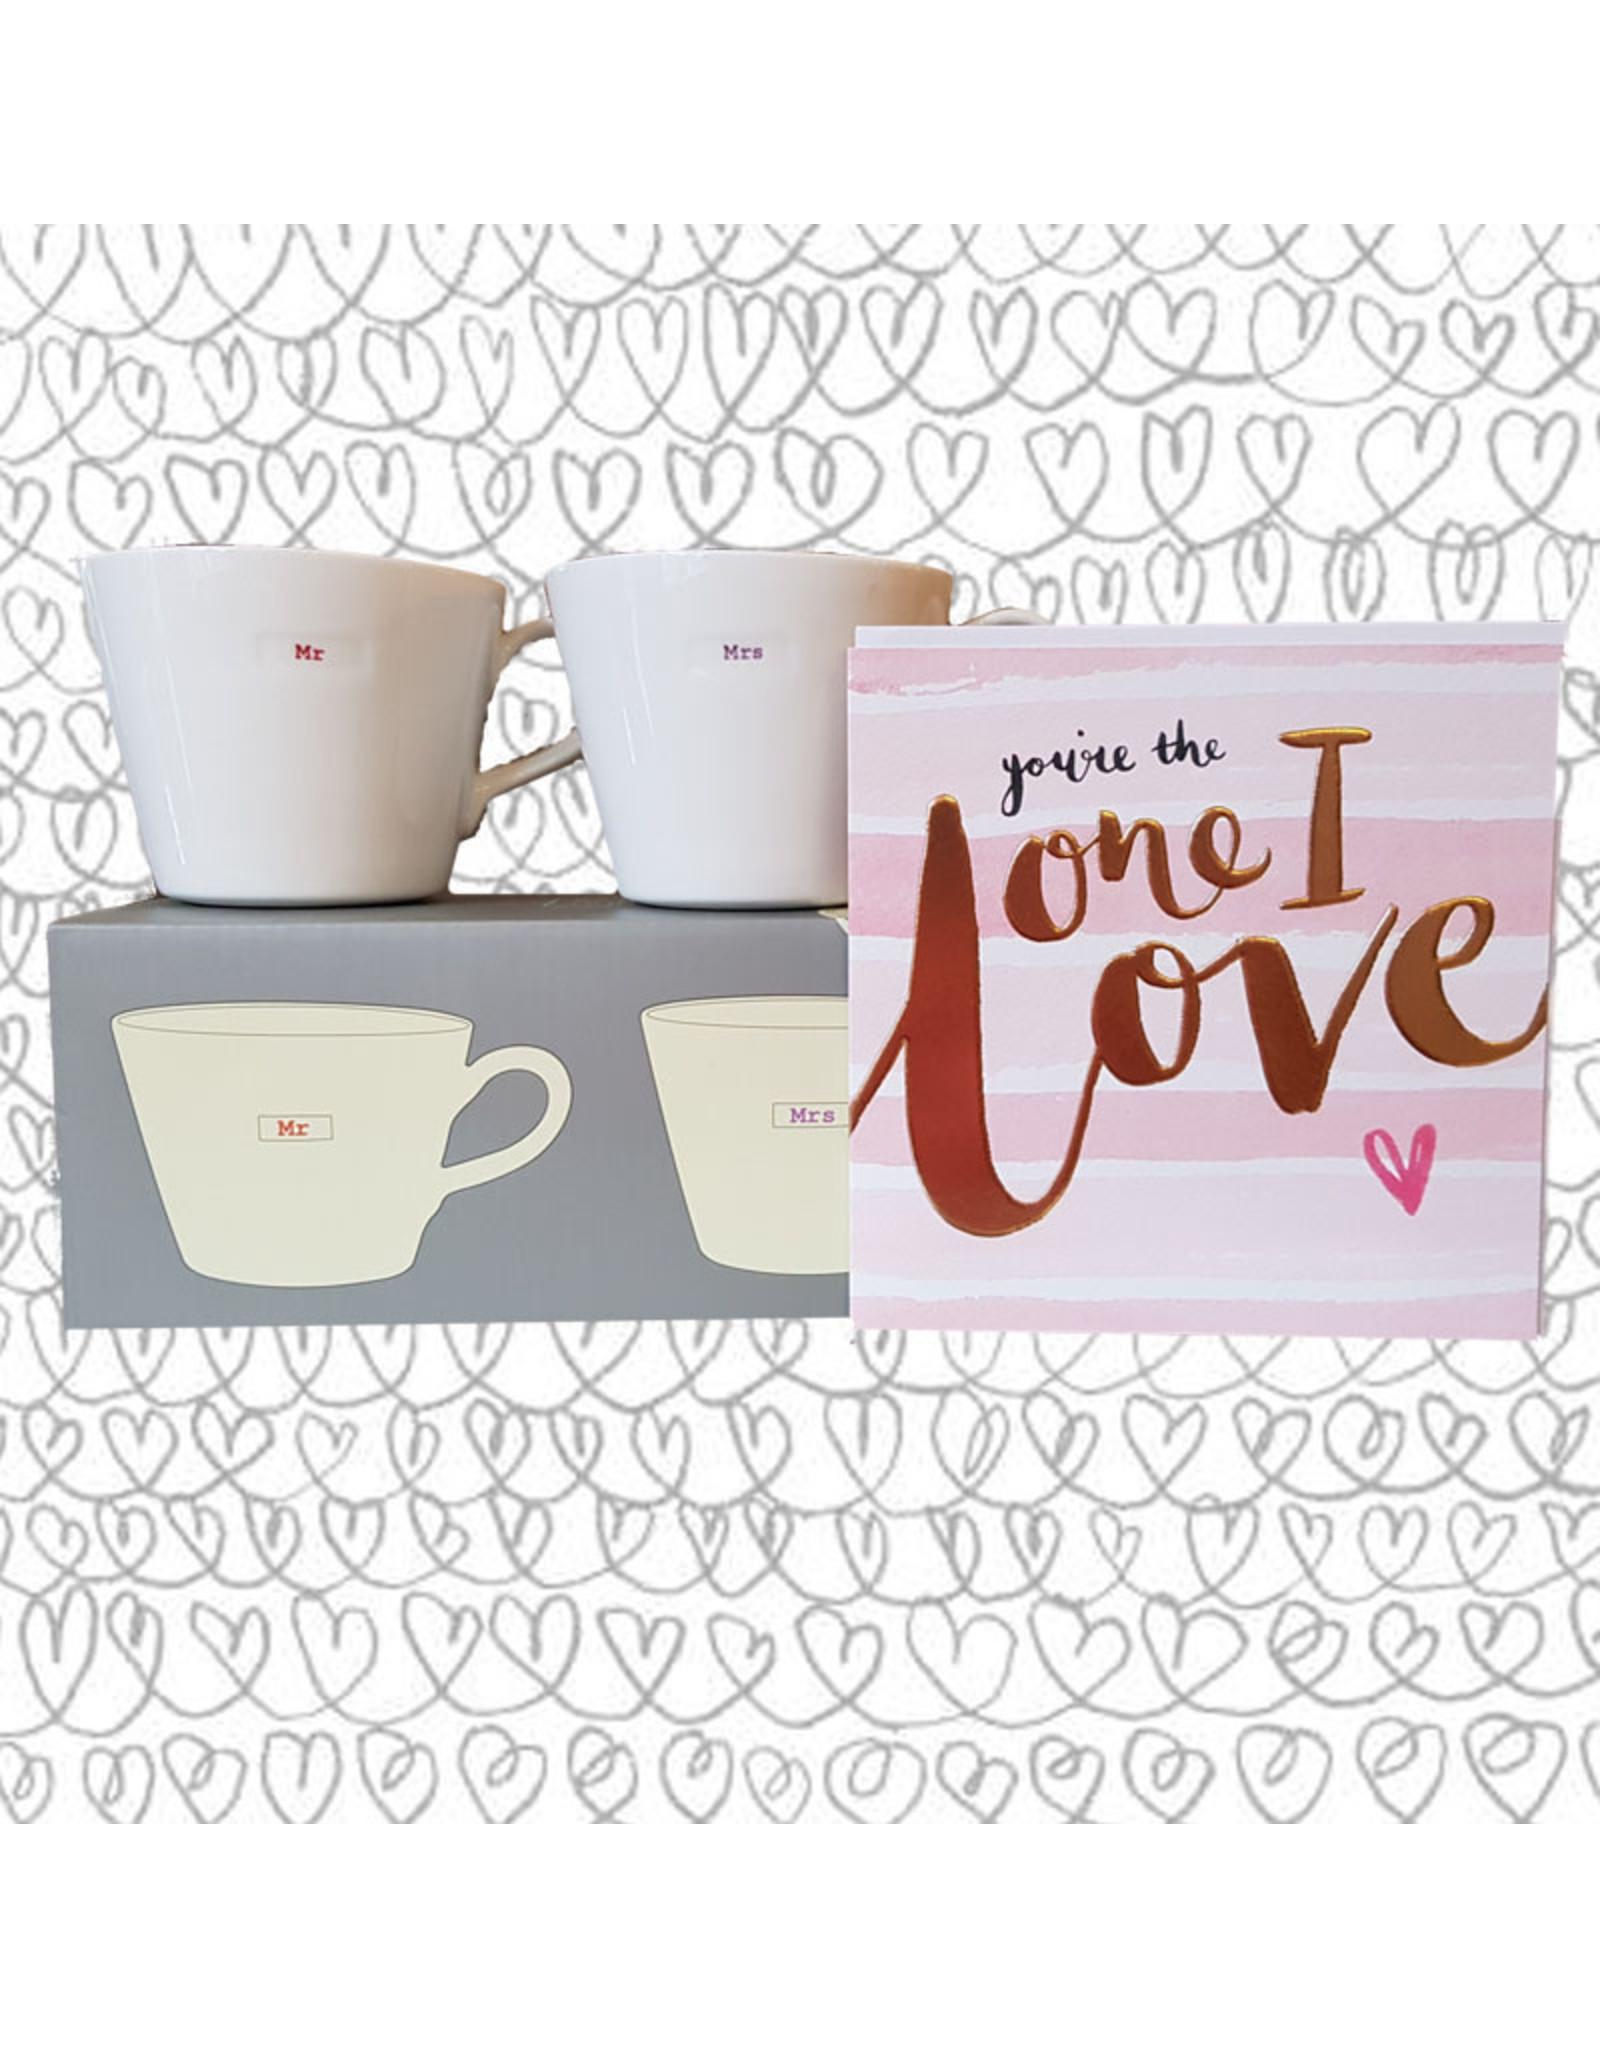 Buckets of Love